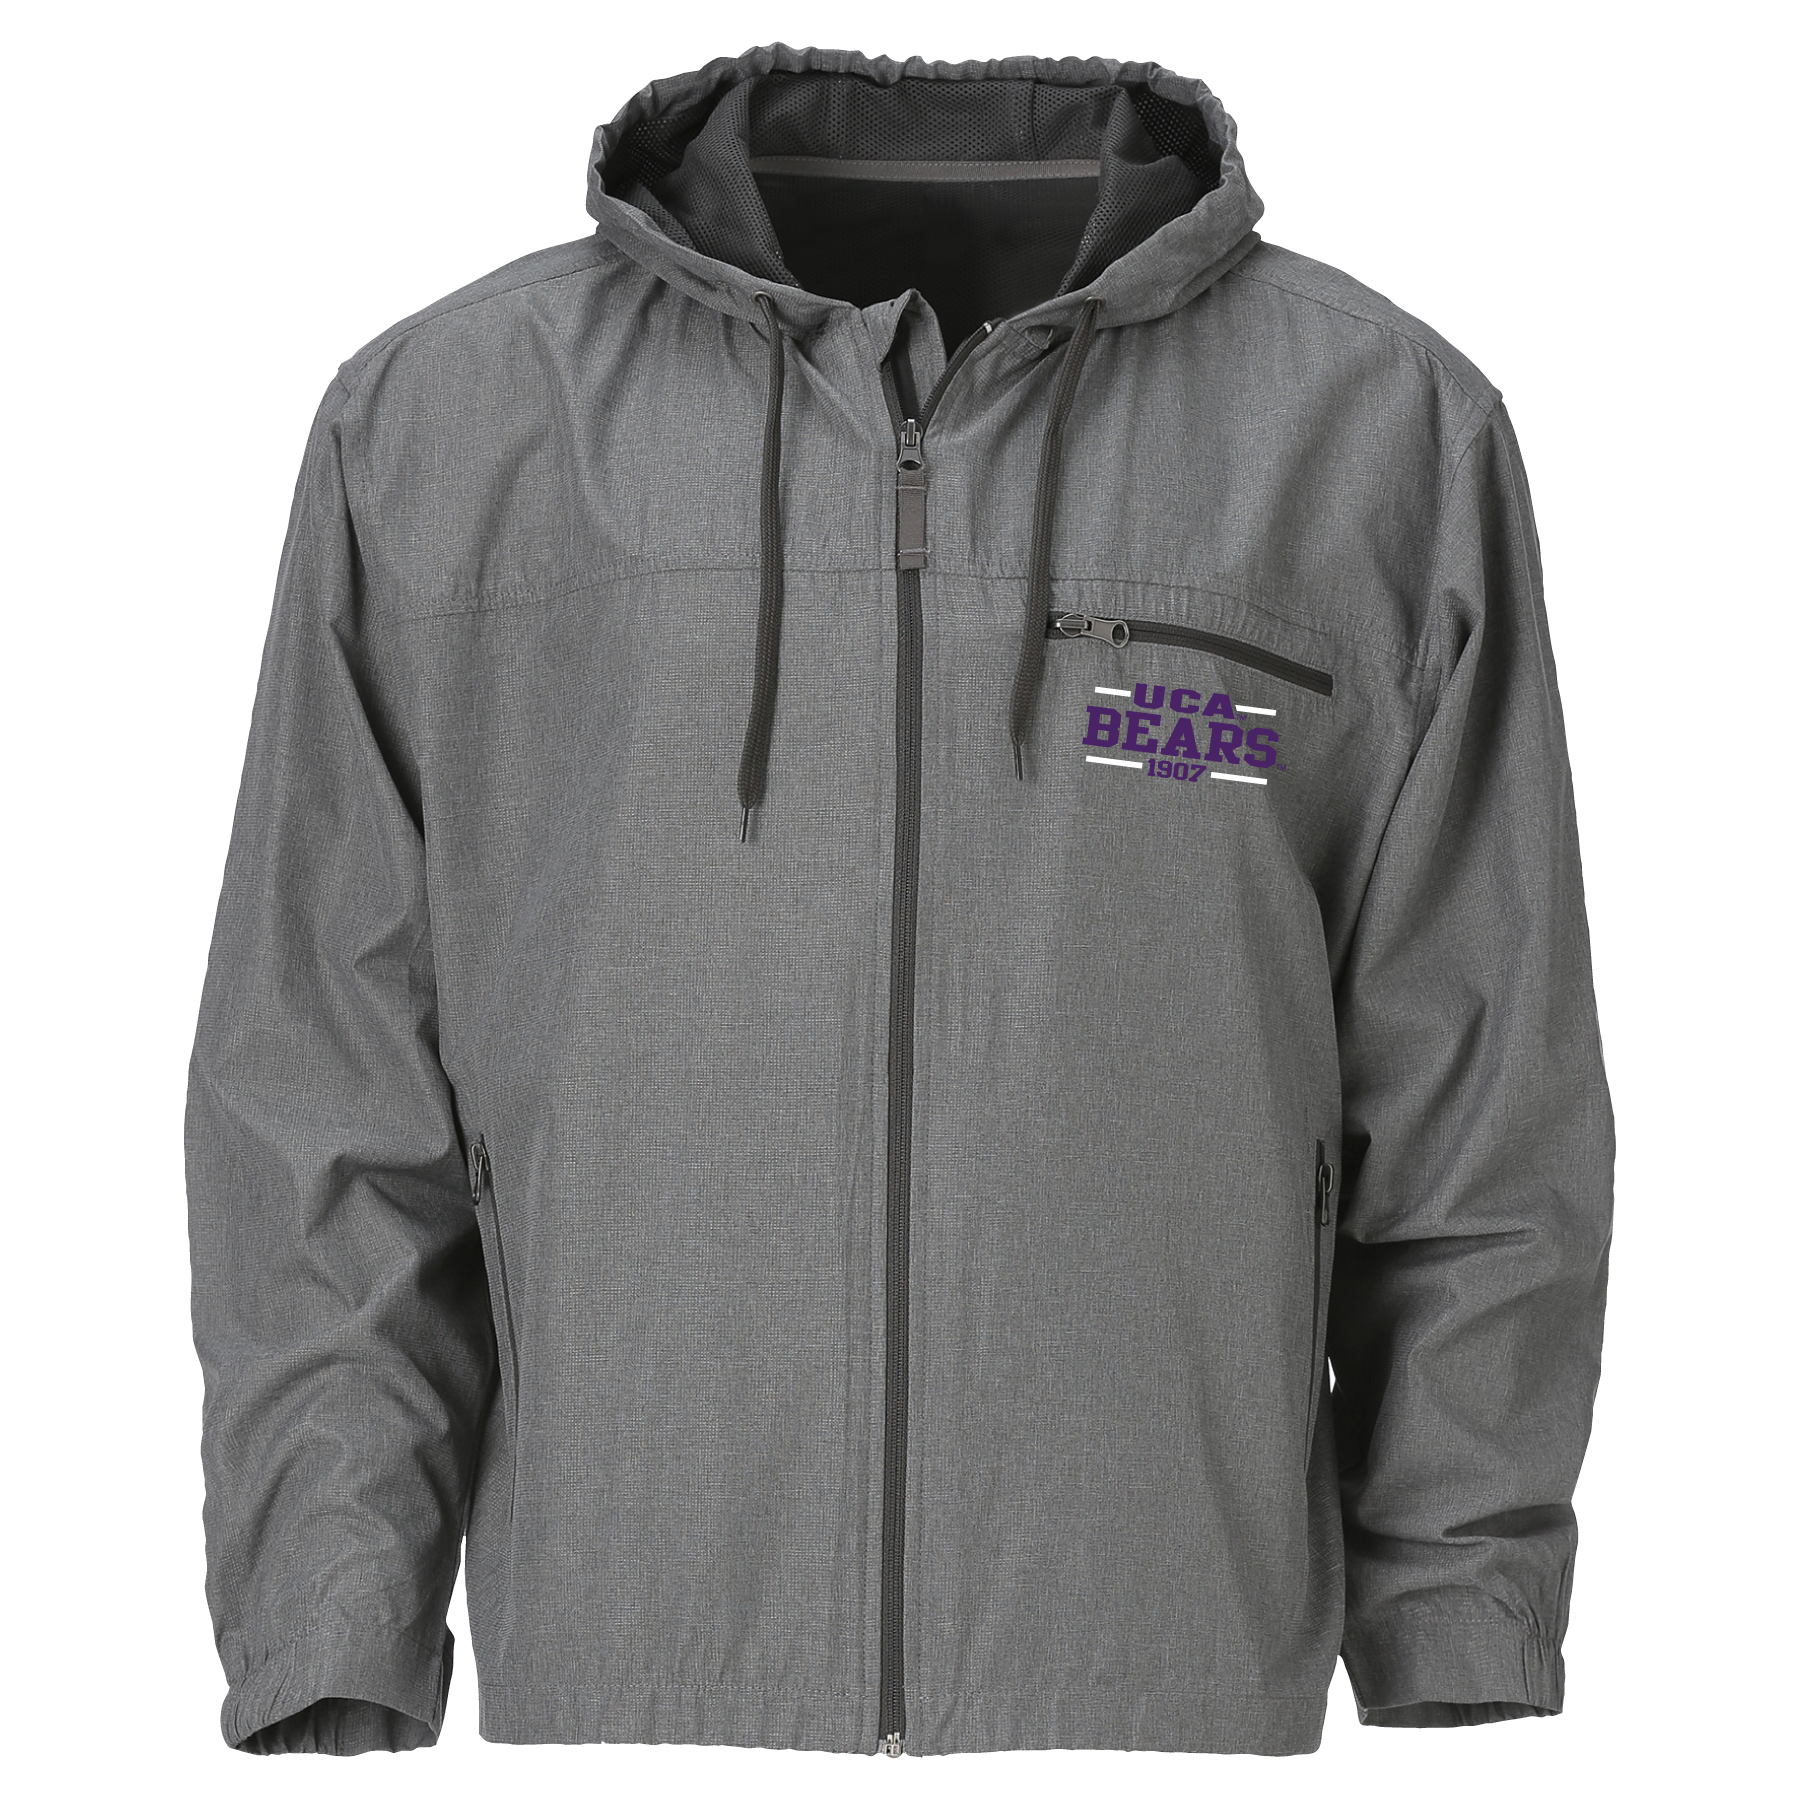 Venture Windbreaker Jacket